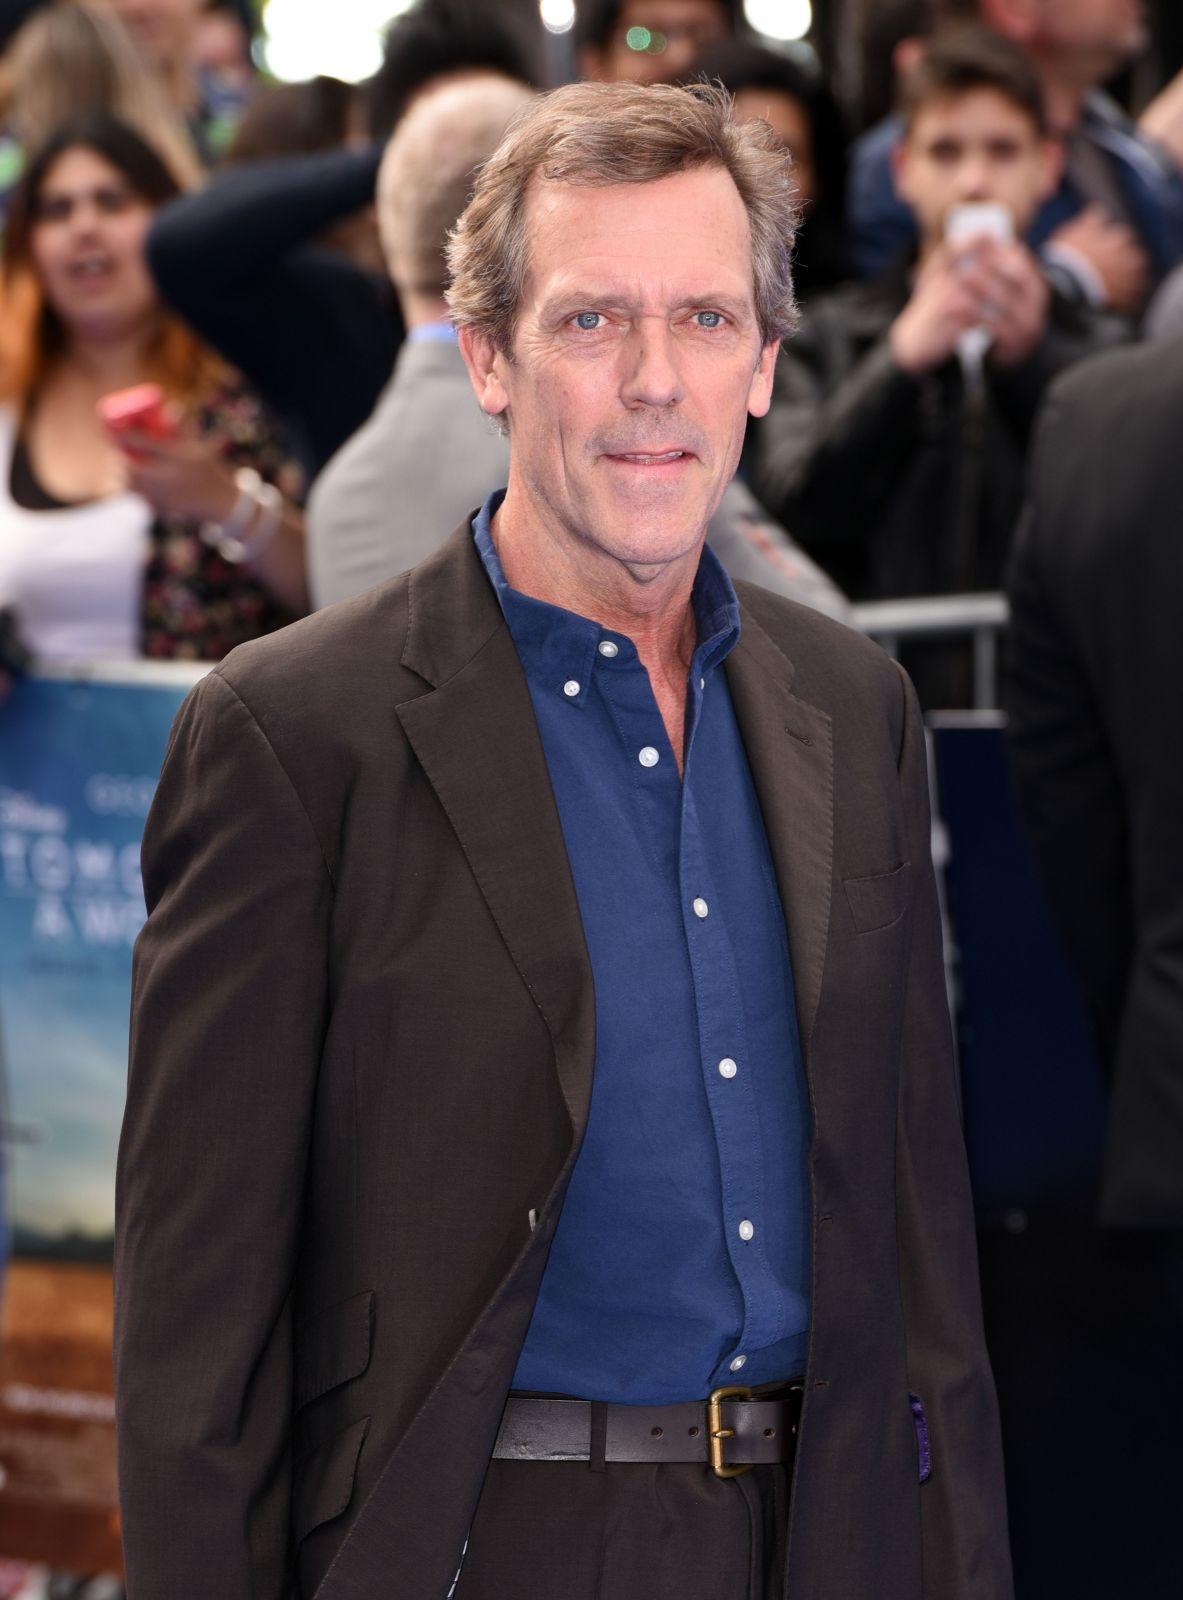 Hugh Laurie28 - Tomorrowland Premiere London 2015.jpg